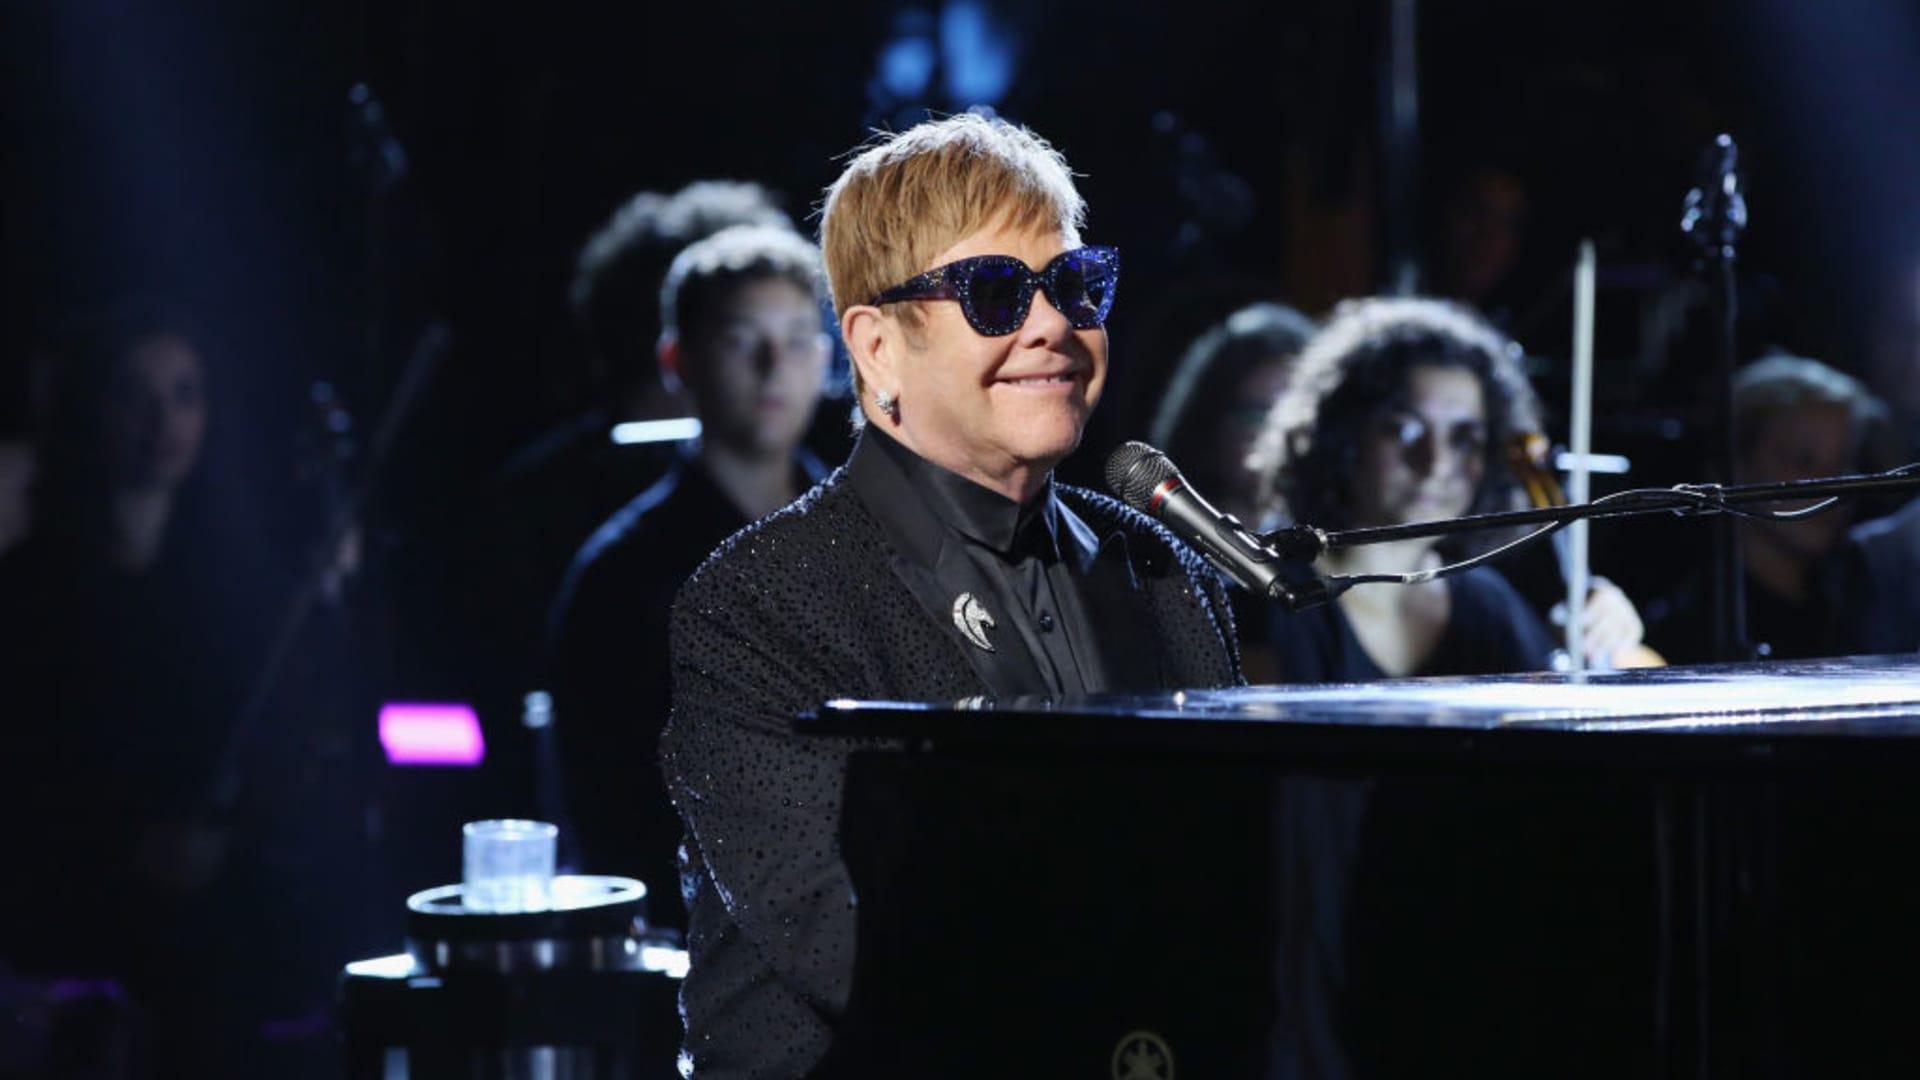 Elton John performs at the Andrea Bocelli show